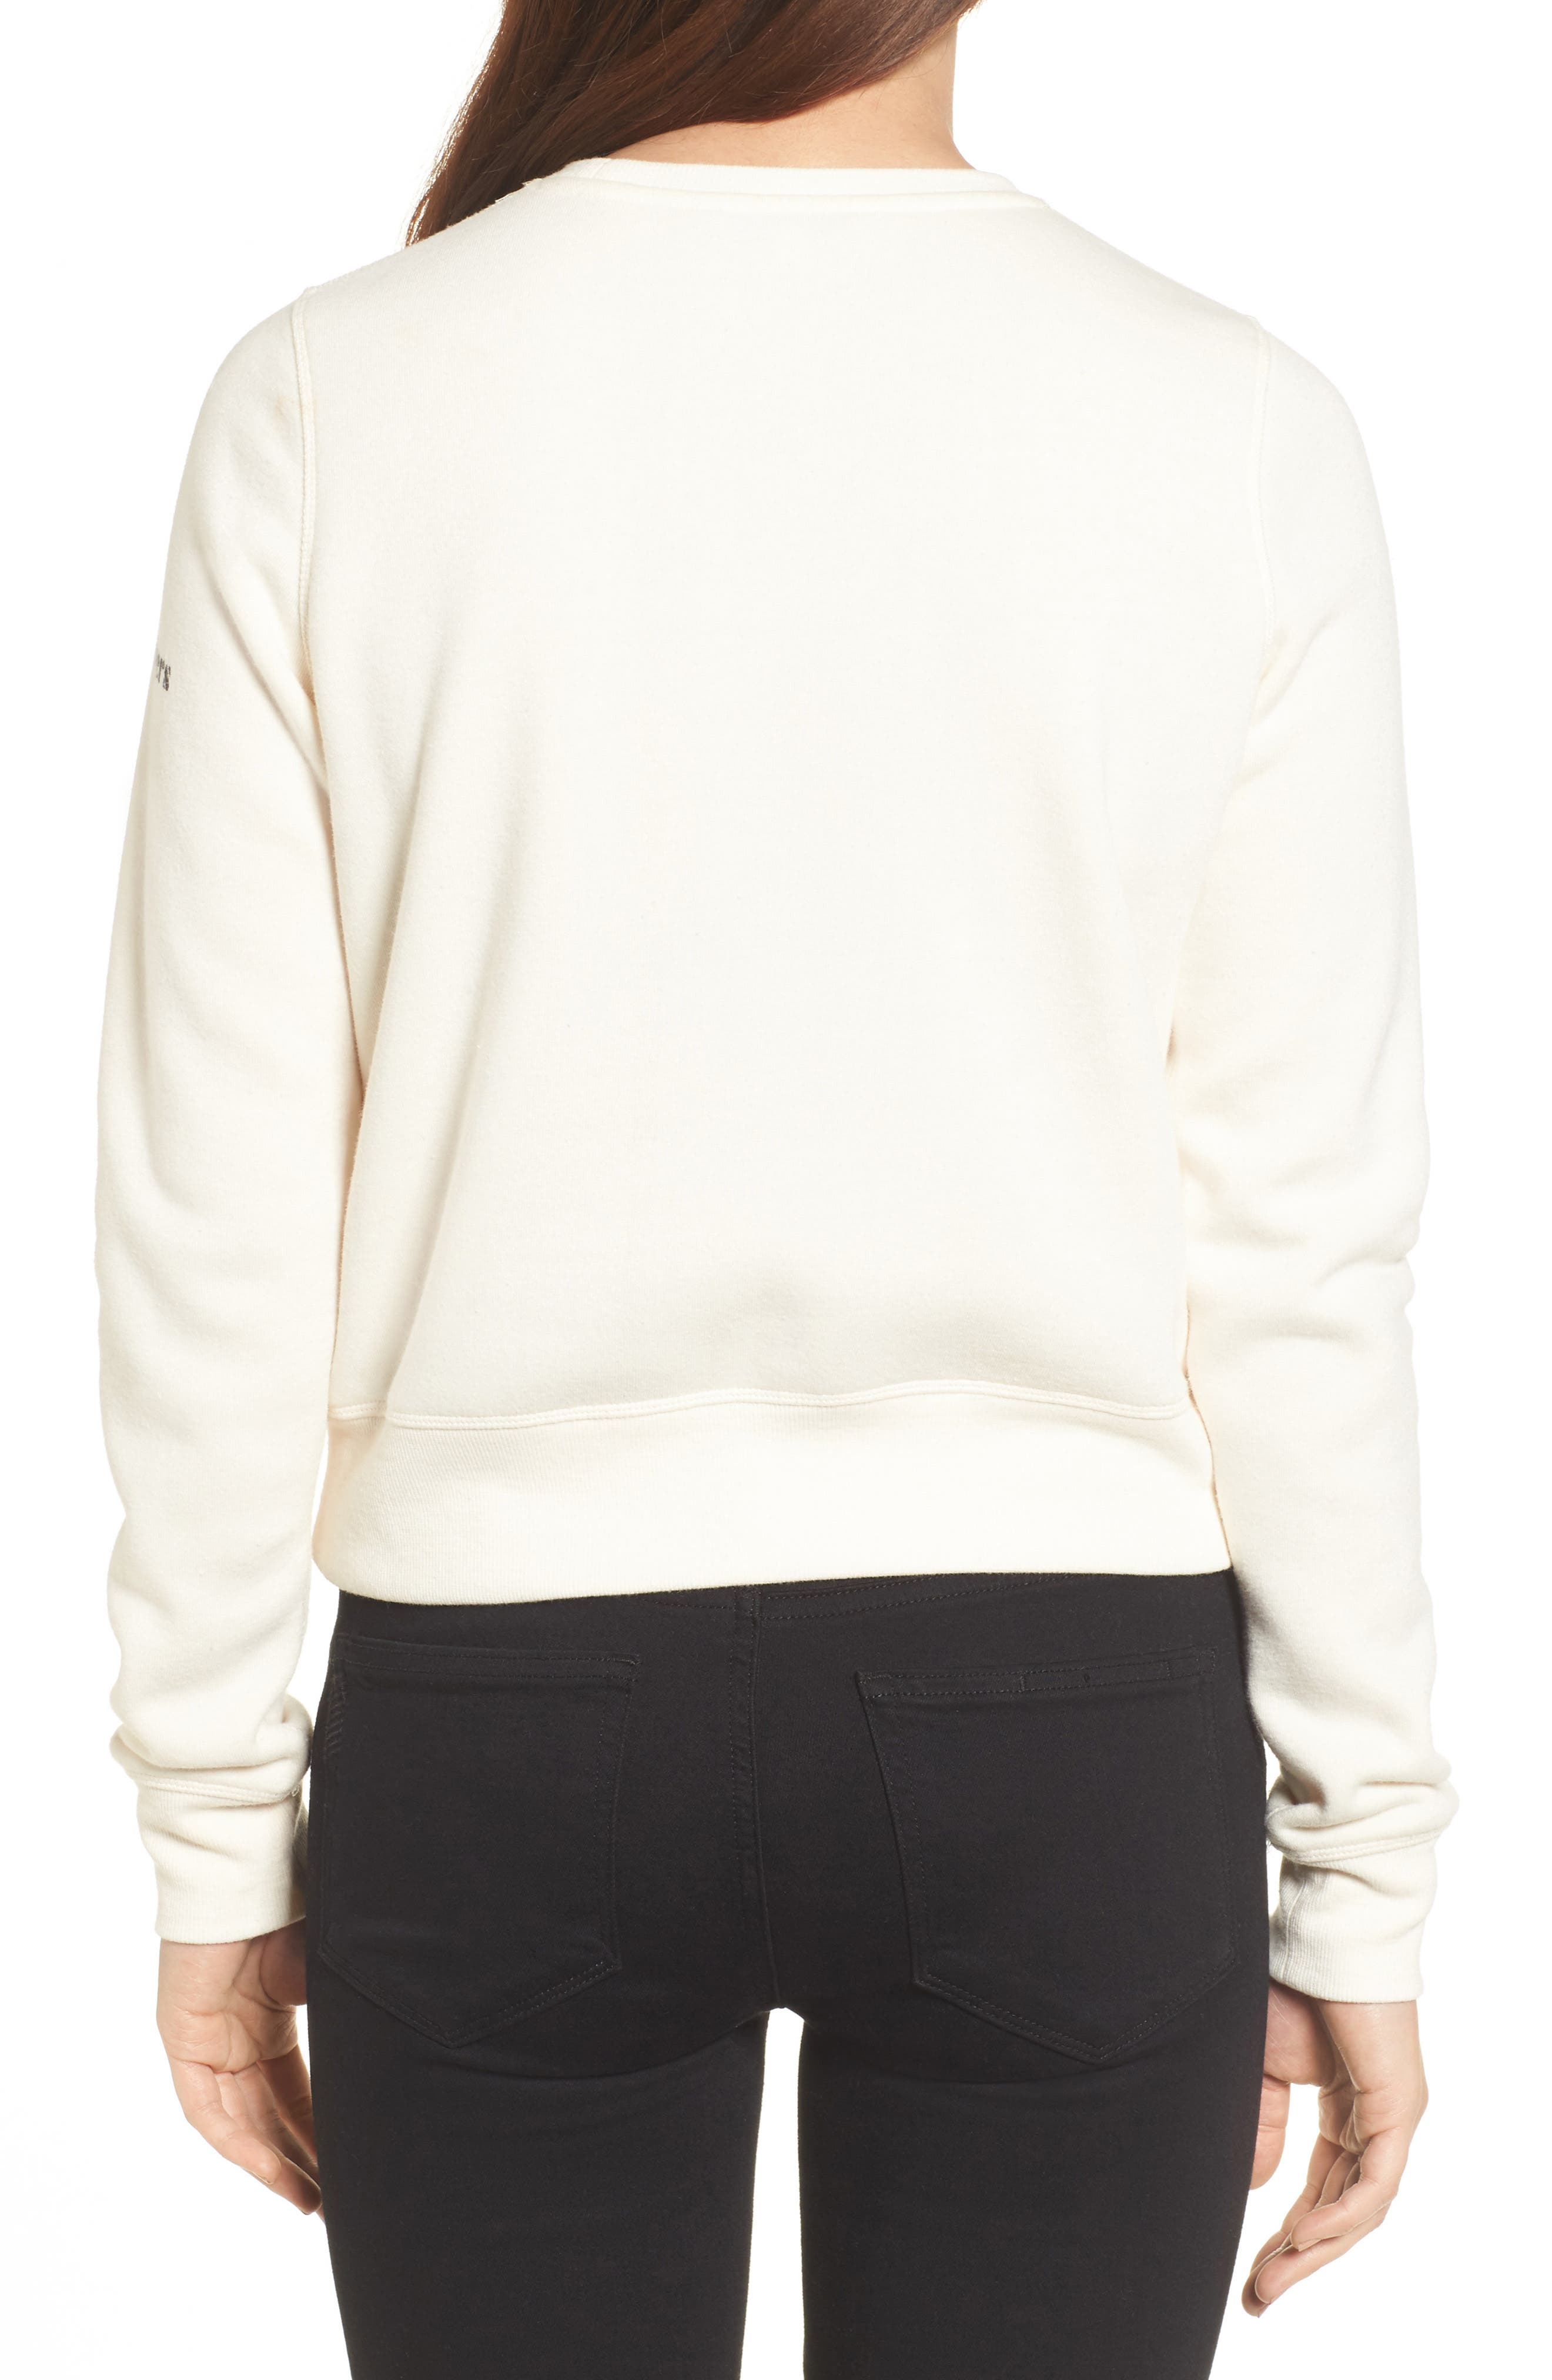 Paris Sweatshirt,                             Alternate thumbnail 2, color,                             Off White/ Black